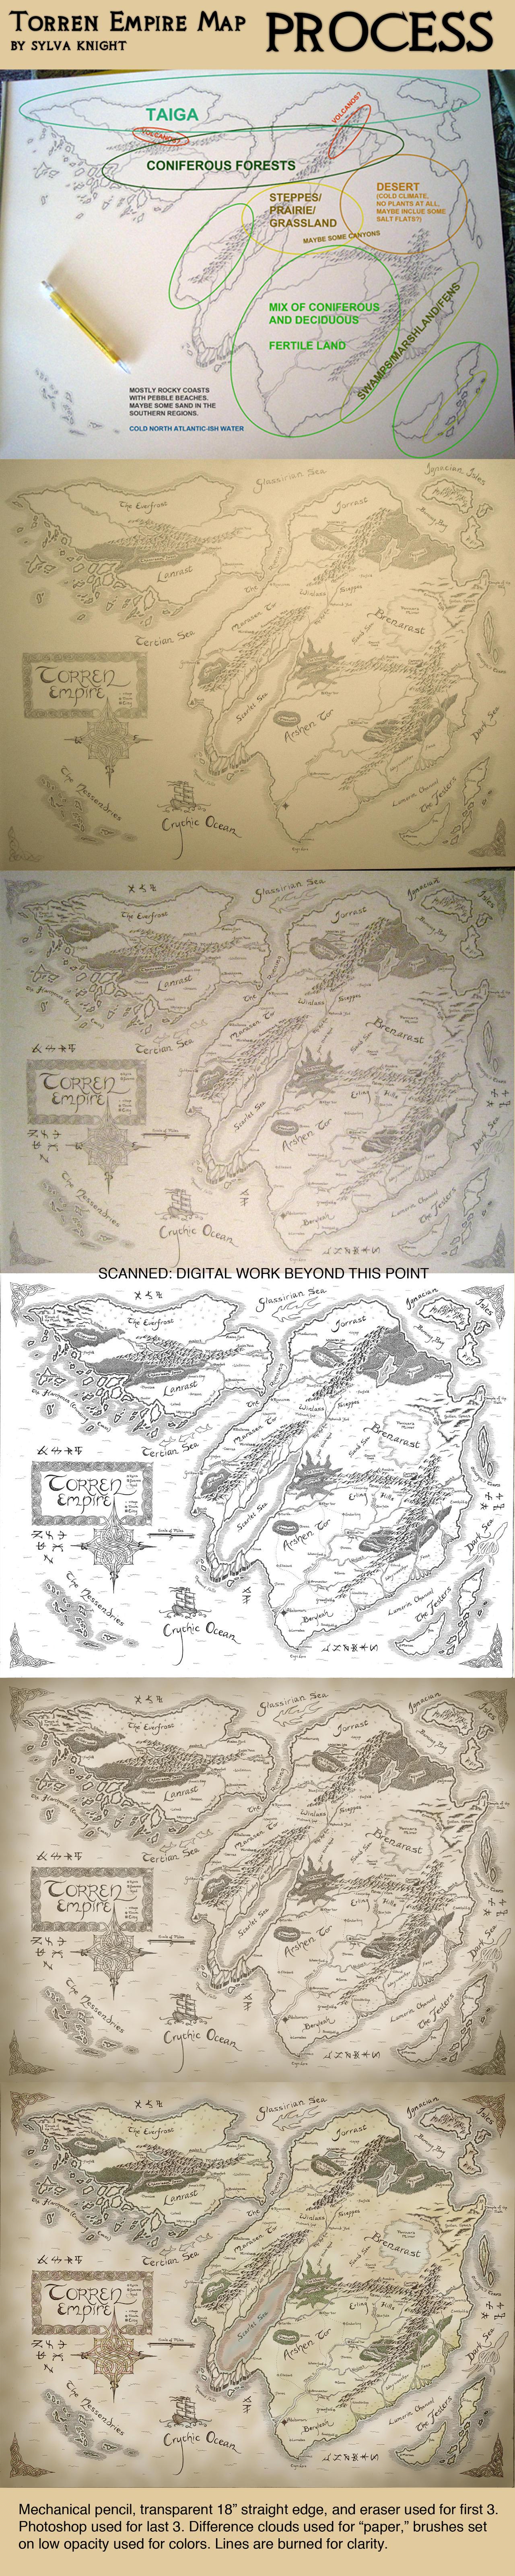 Torren Empire Process by SylvaKnight